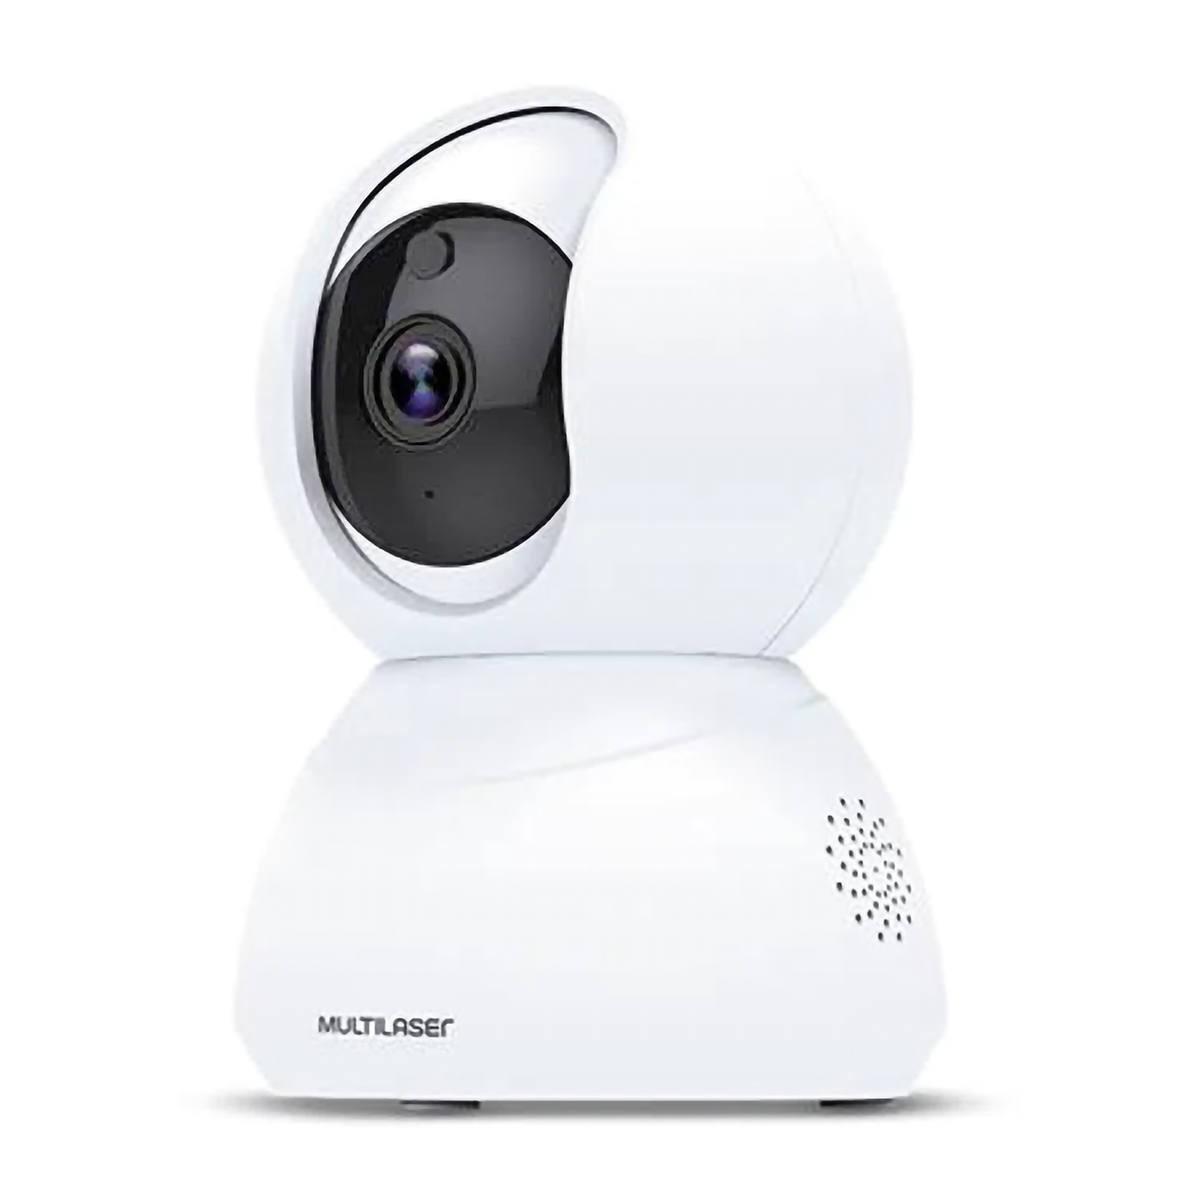 Câmera Robô Inteligente IP Wi-Fi Full HD Áudio Bidirecional Controle de Movimento e Auto Tracking Multilaser Liv SE221